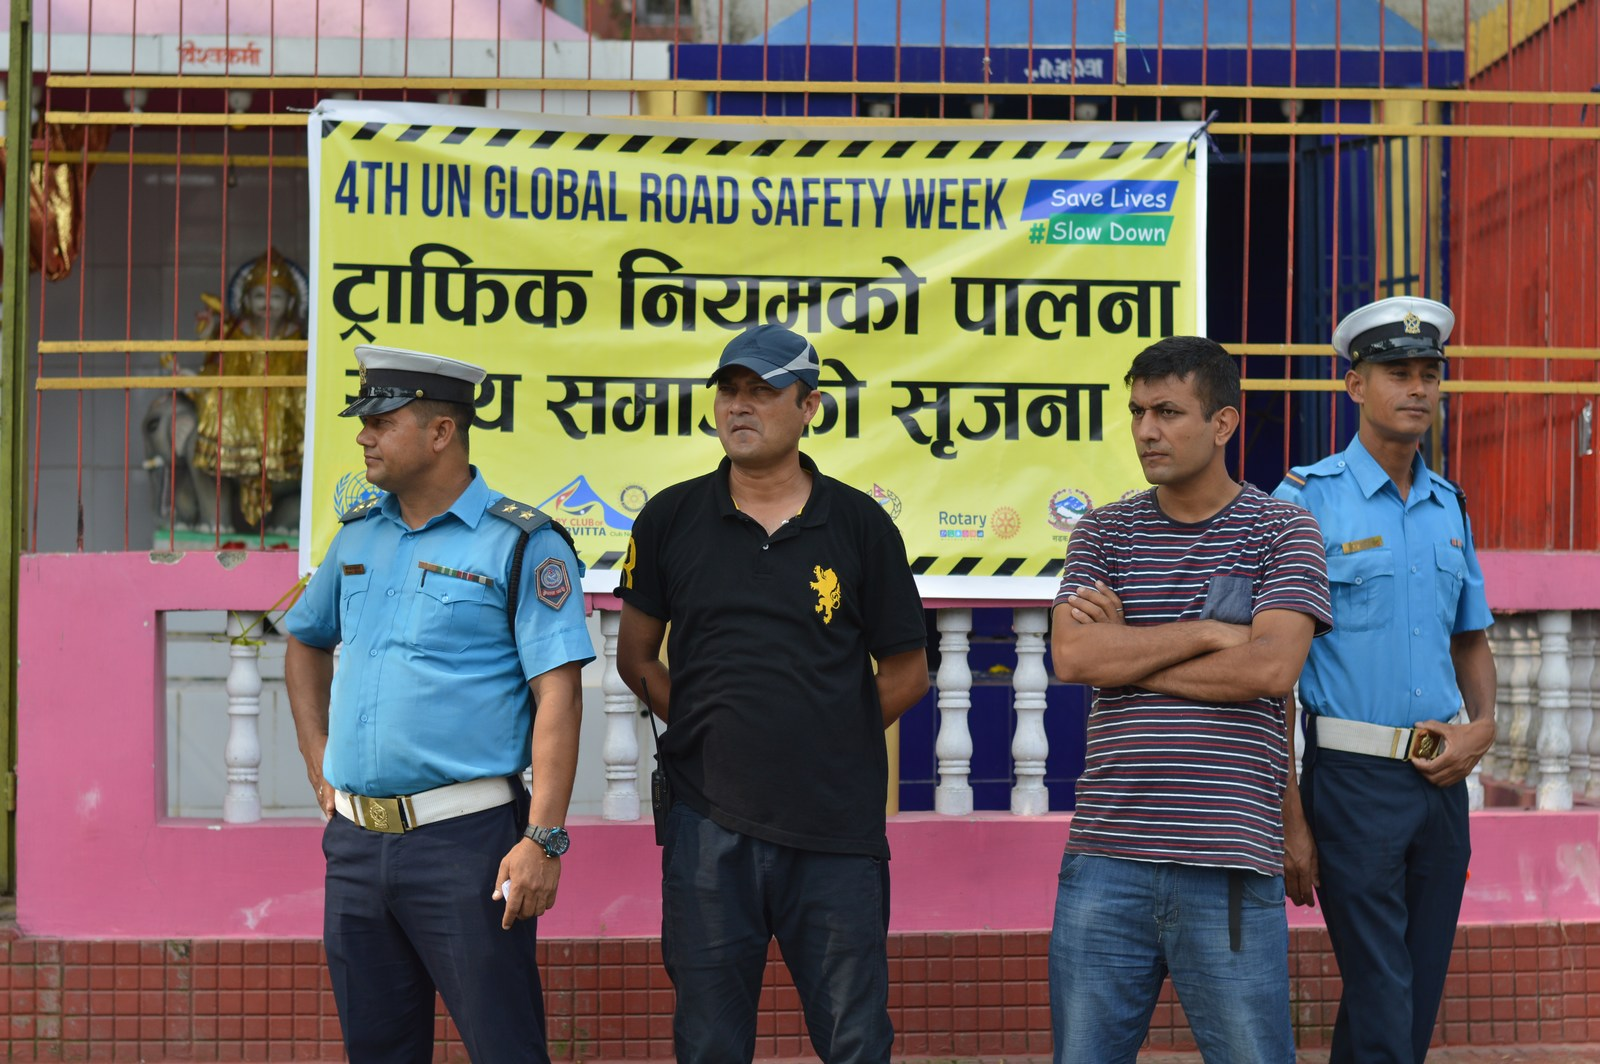 4th-UN-Global-Road-Safety-Week-2017-Traffic-Awareness-Program-Rotary-club-of-Kakarvitta-10